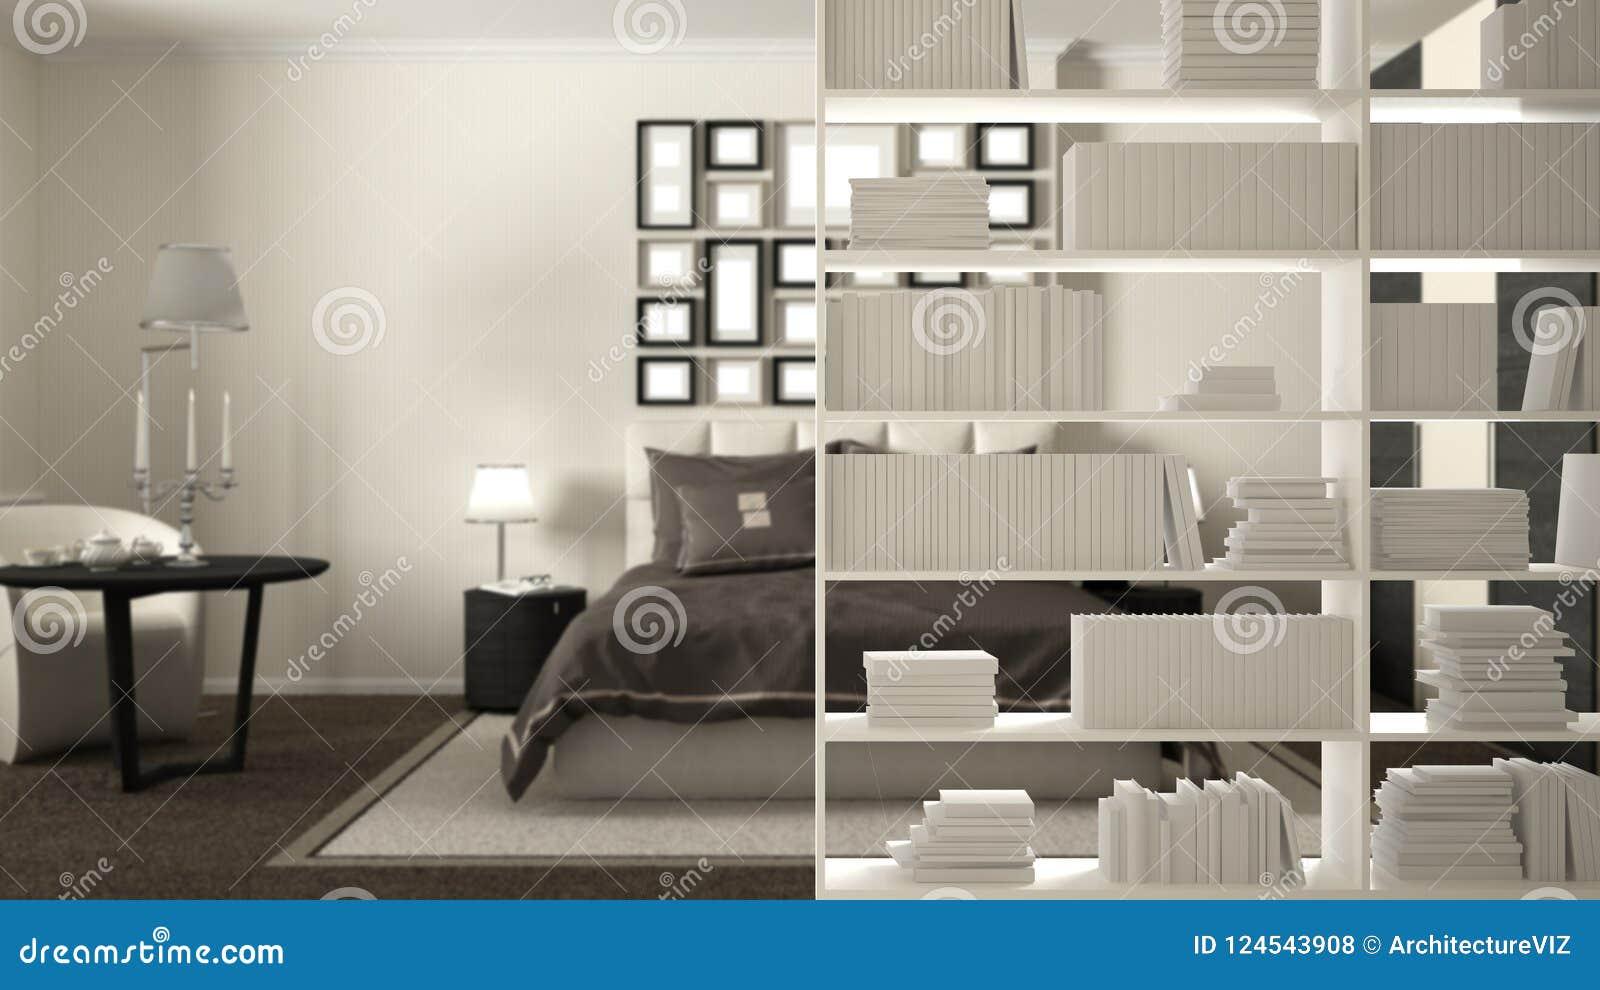 Bookshelf Close Up Shelving Foreground Interior Design Concept Modern Hotel Bedroom Stock Illustration Illustration Of Concept Bookshelf 124543908